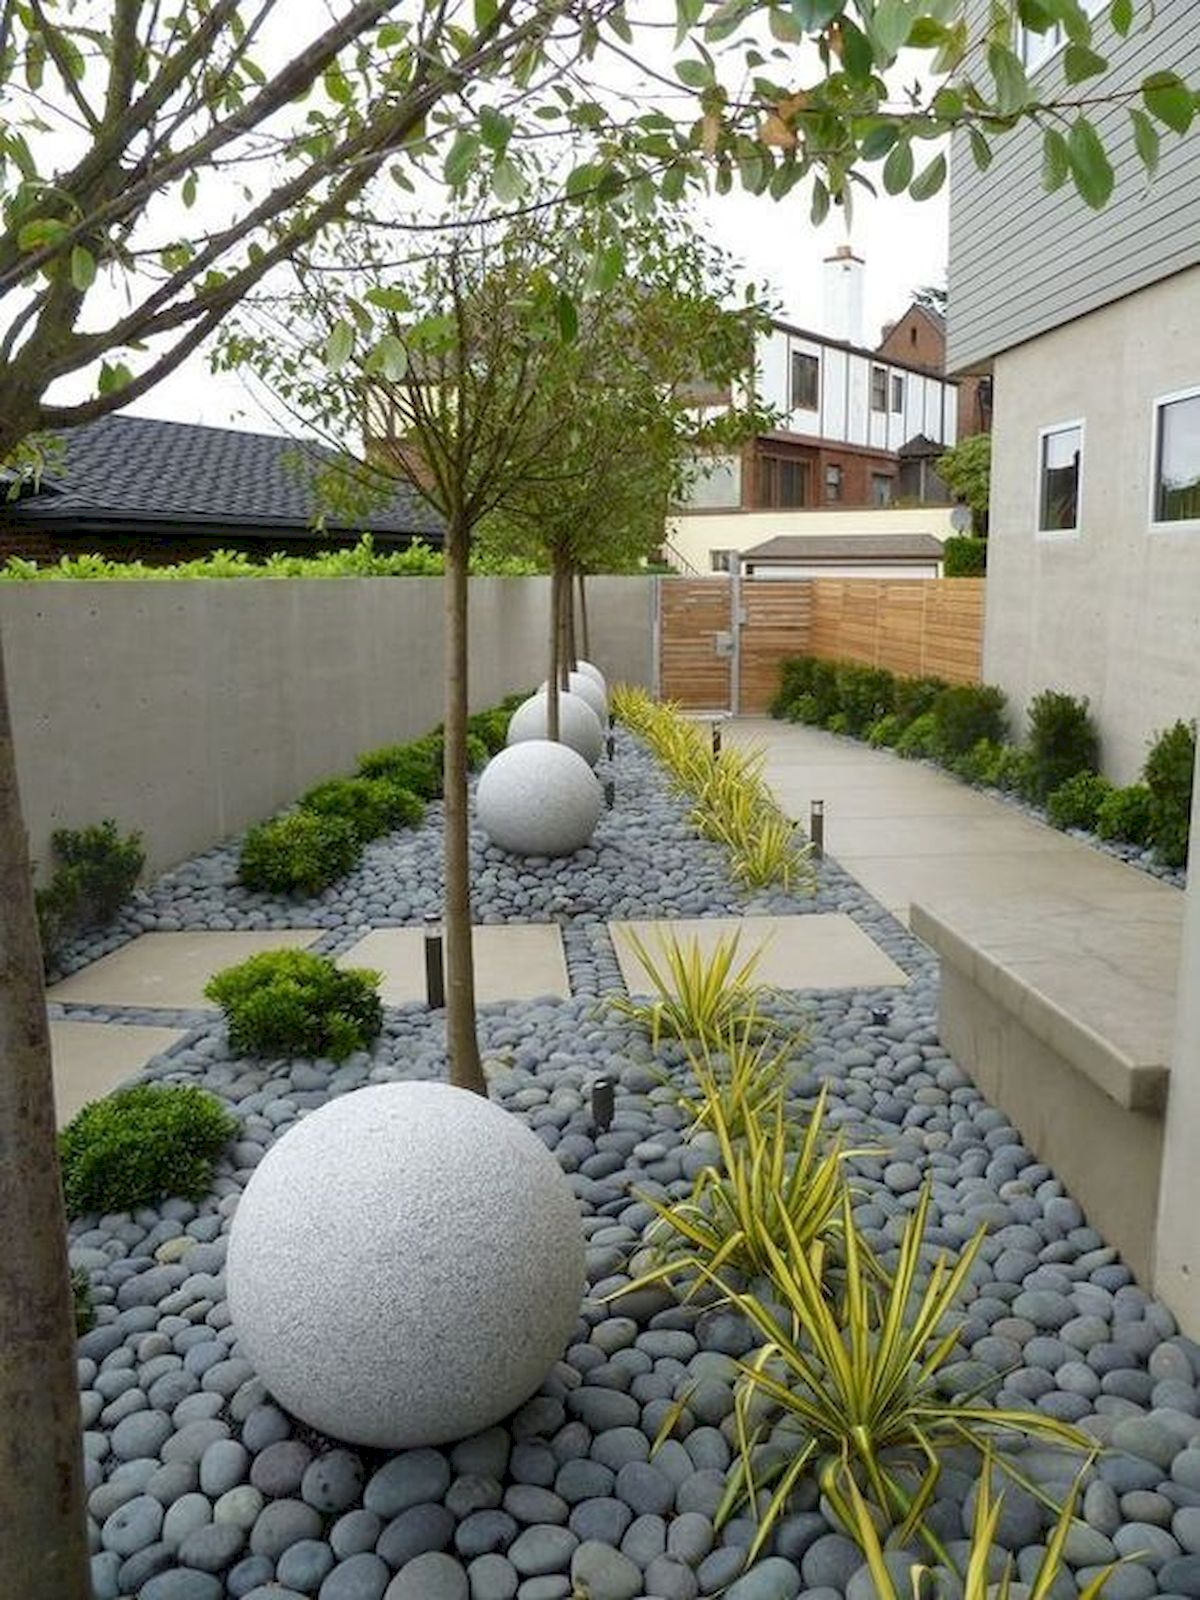 48 Stunning Front Yard Landscaping Ideas That Make Beautiful Garden (48)